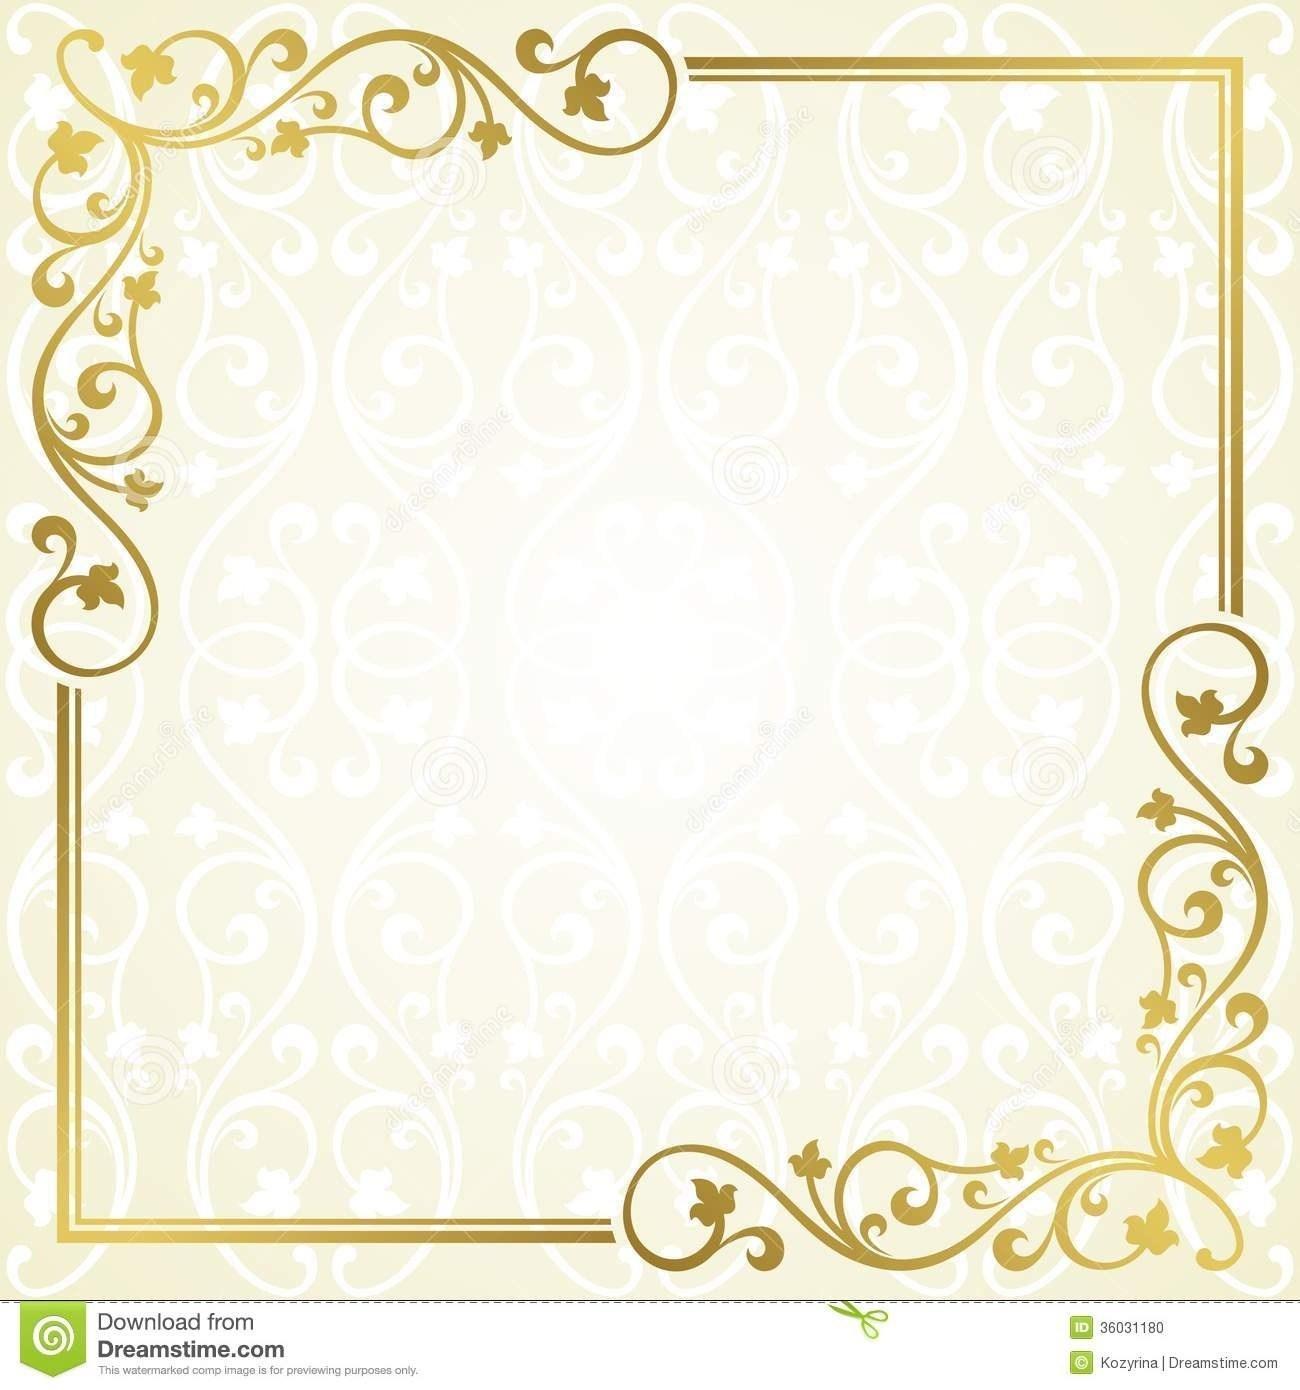 Download Template Invitation Card